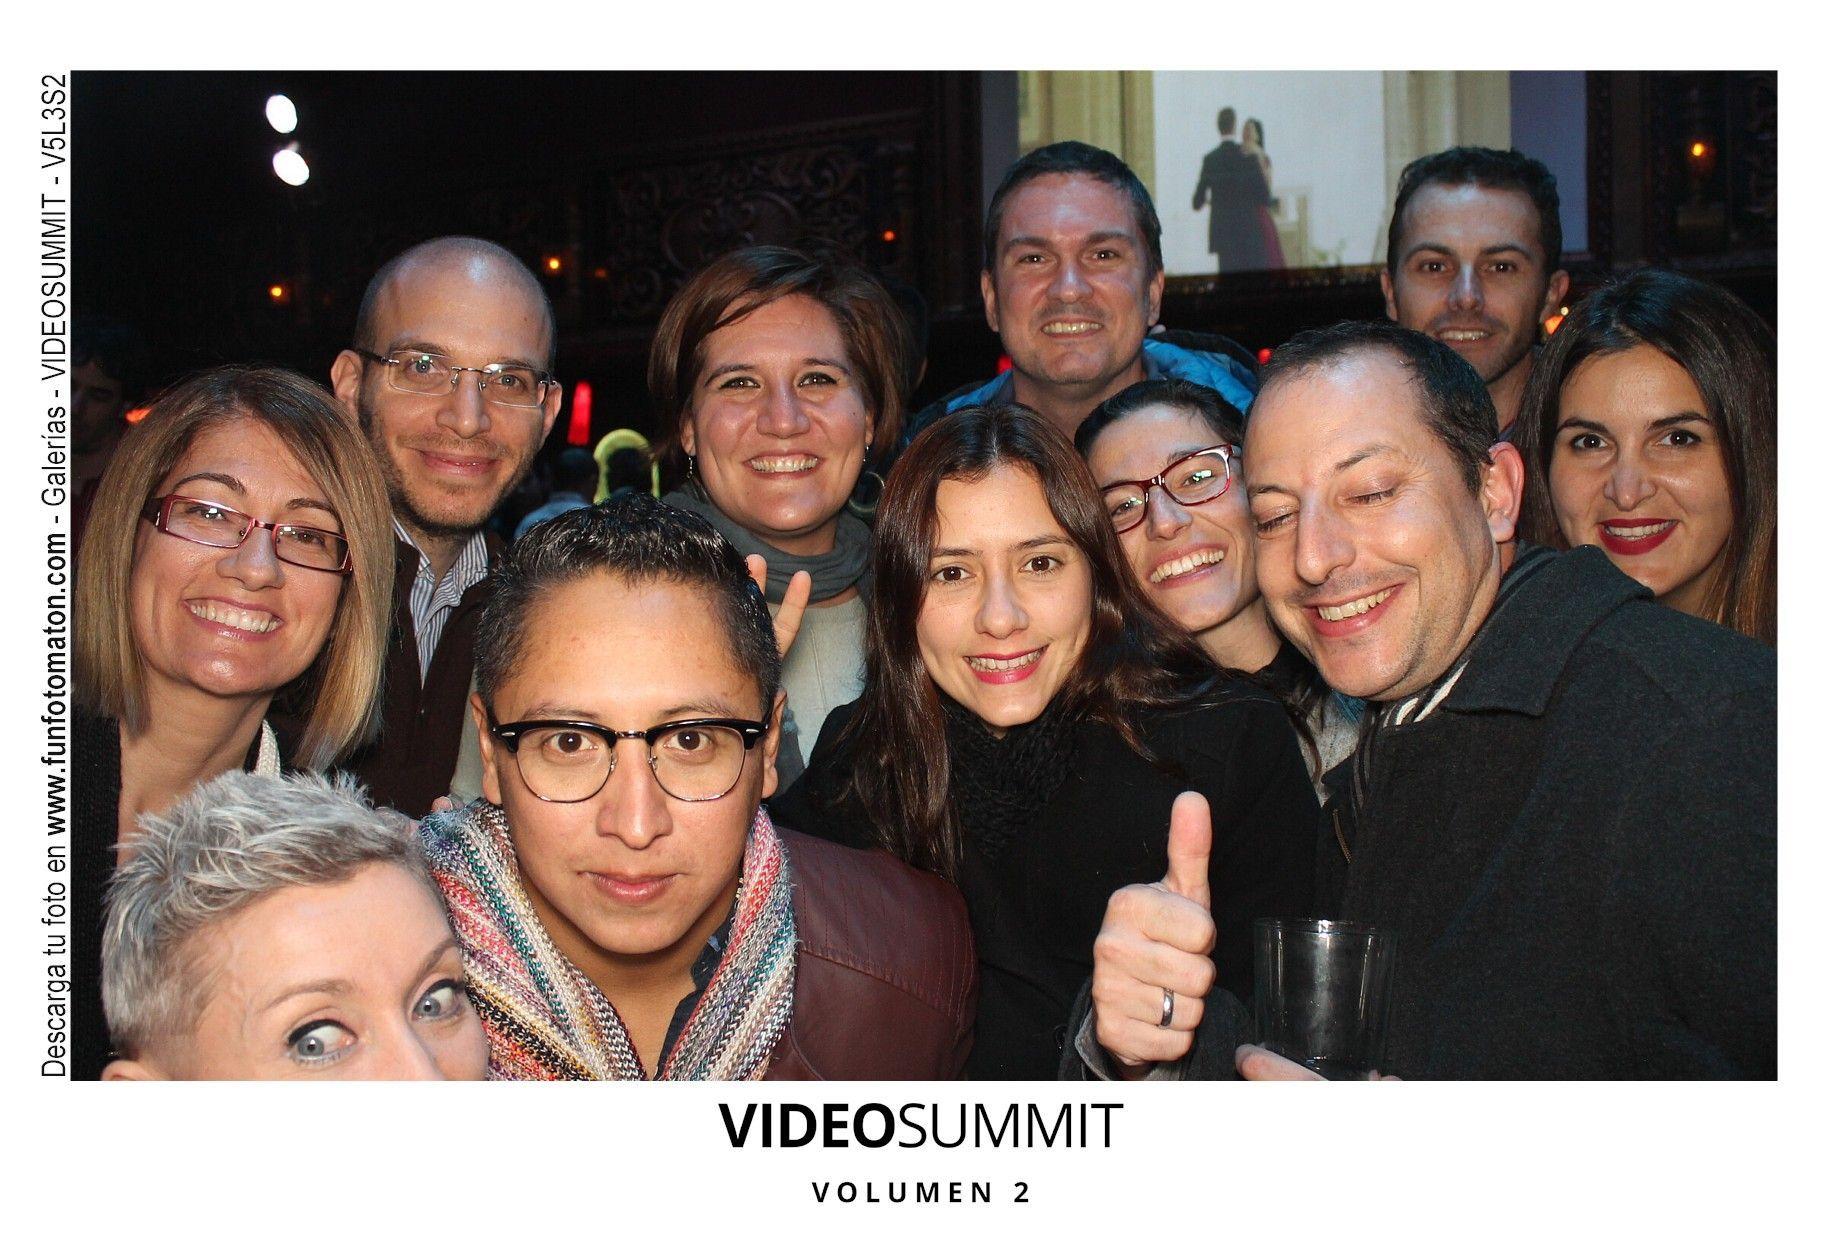 videosummit-vol2-club-party-045